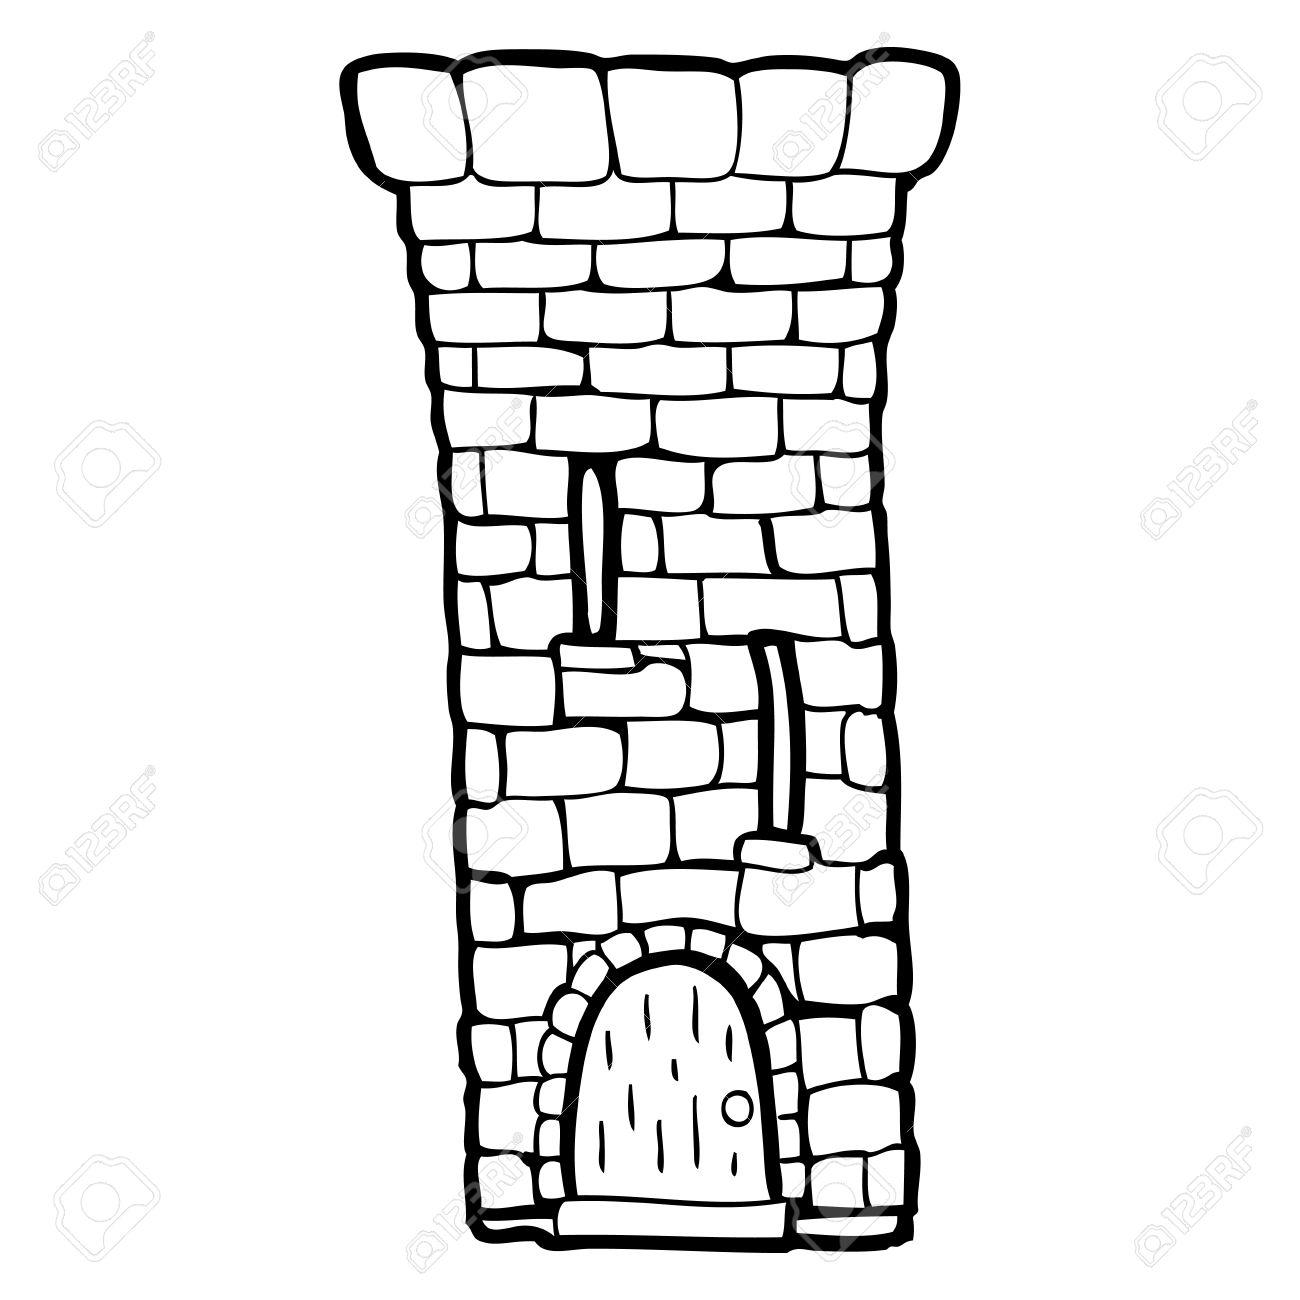 Tower clipart castle, Tower castle Transparent FREE for.